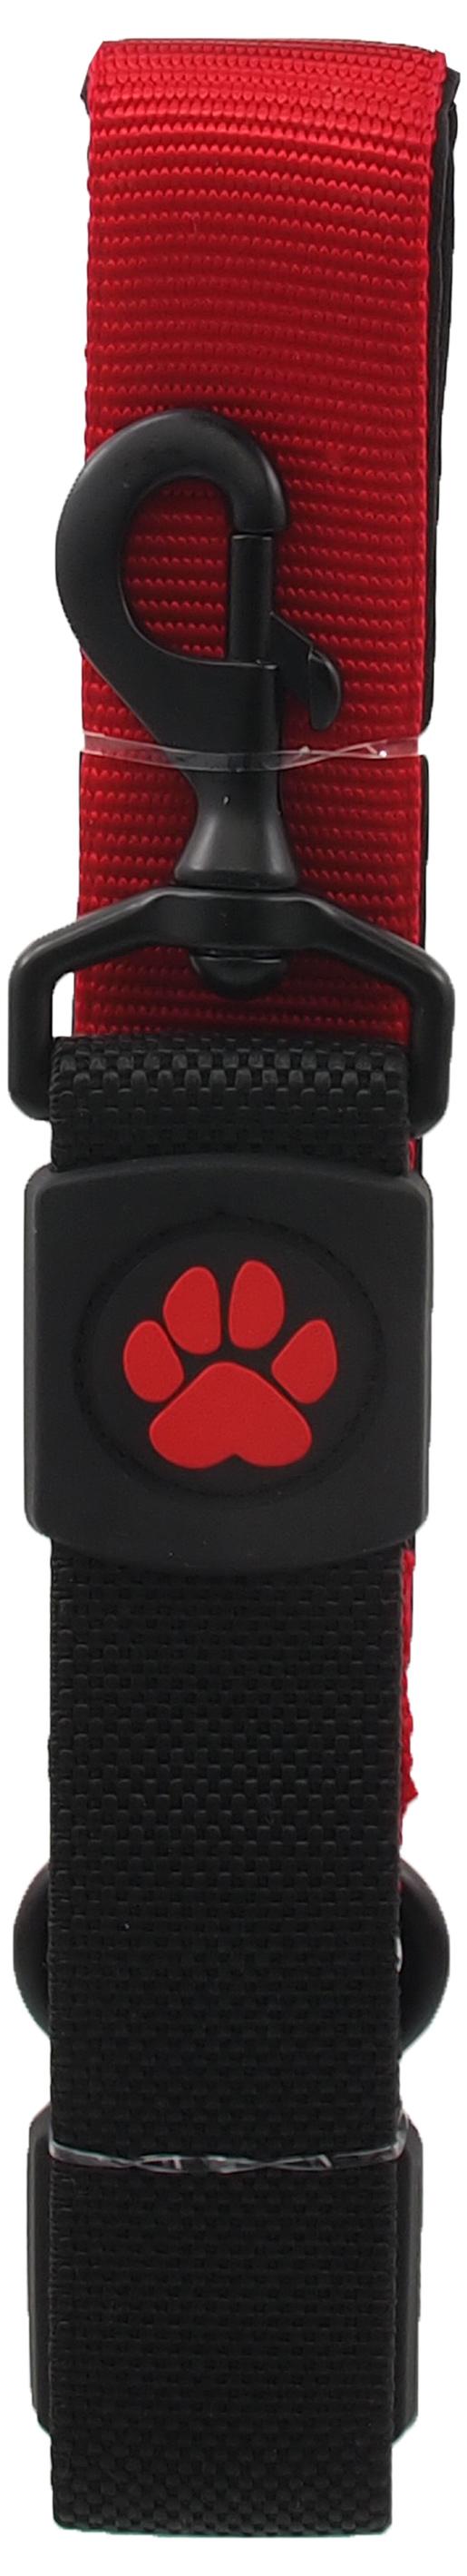 Dog Fantasy Vodítko Active Dog Bungee Neoprene XL červené 3,8x55cm